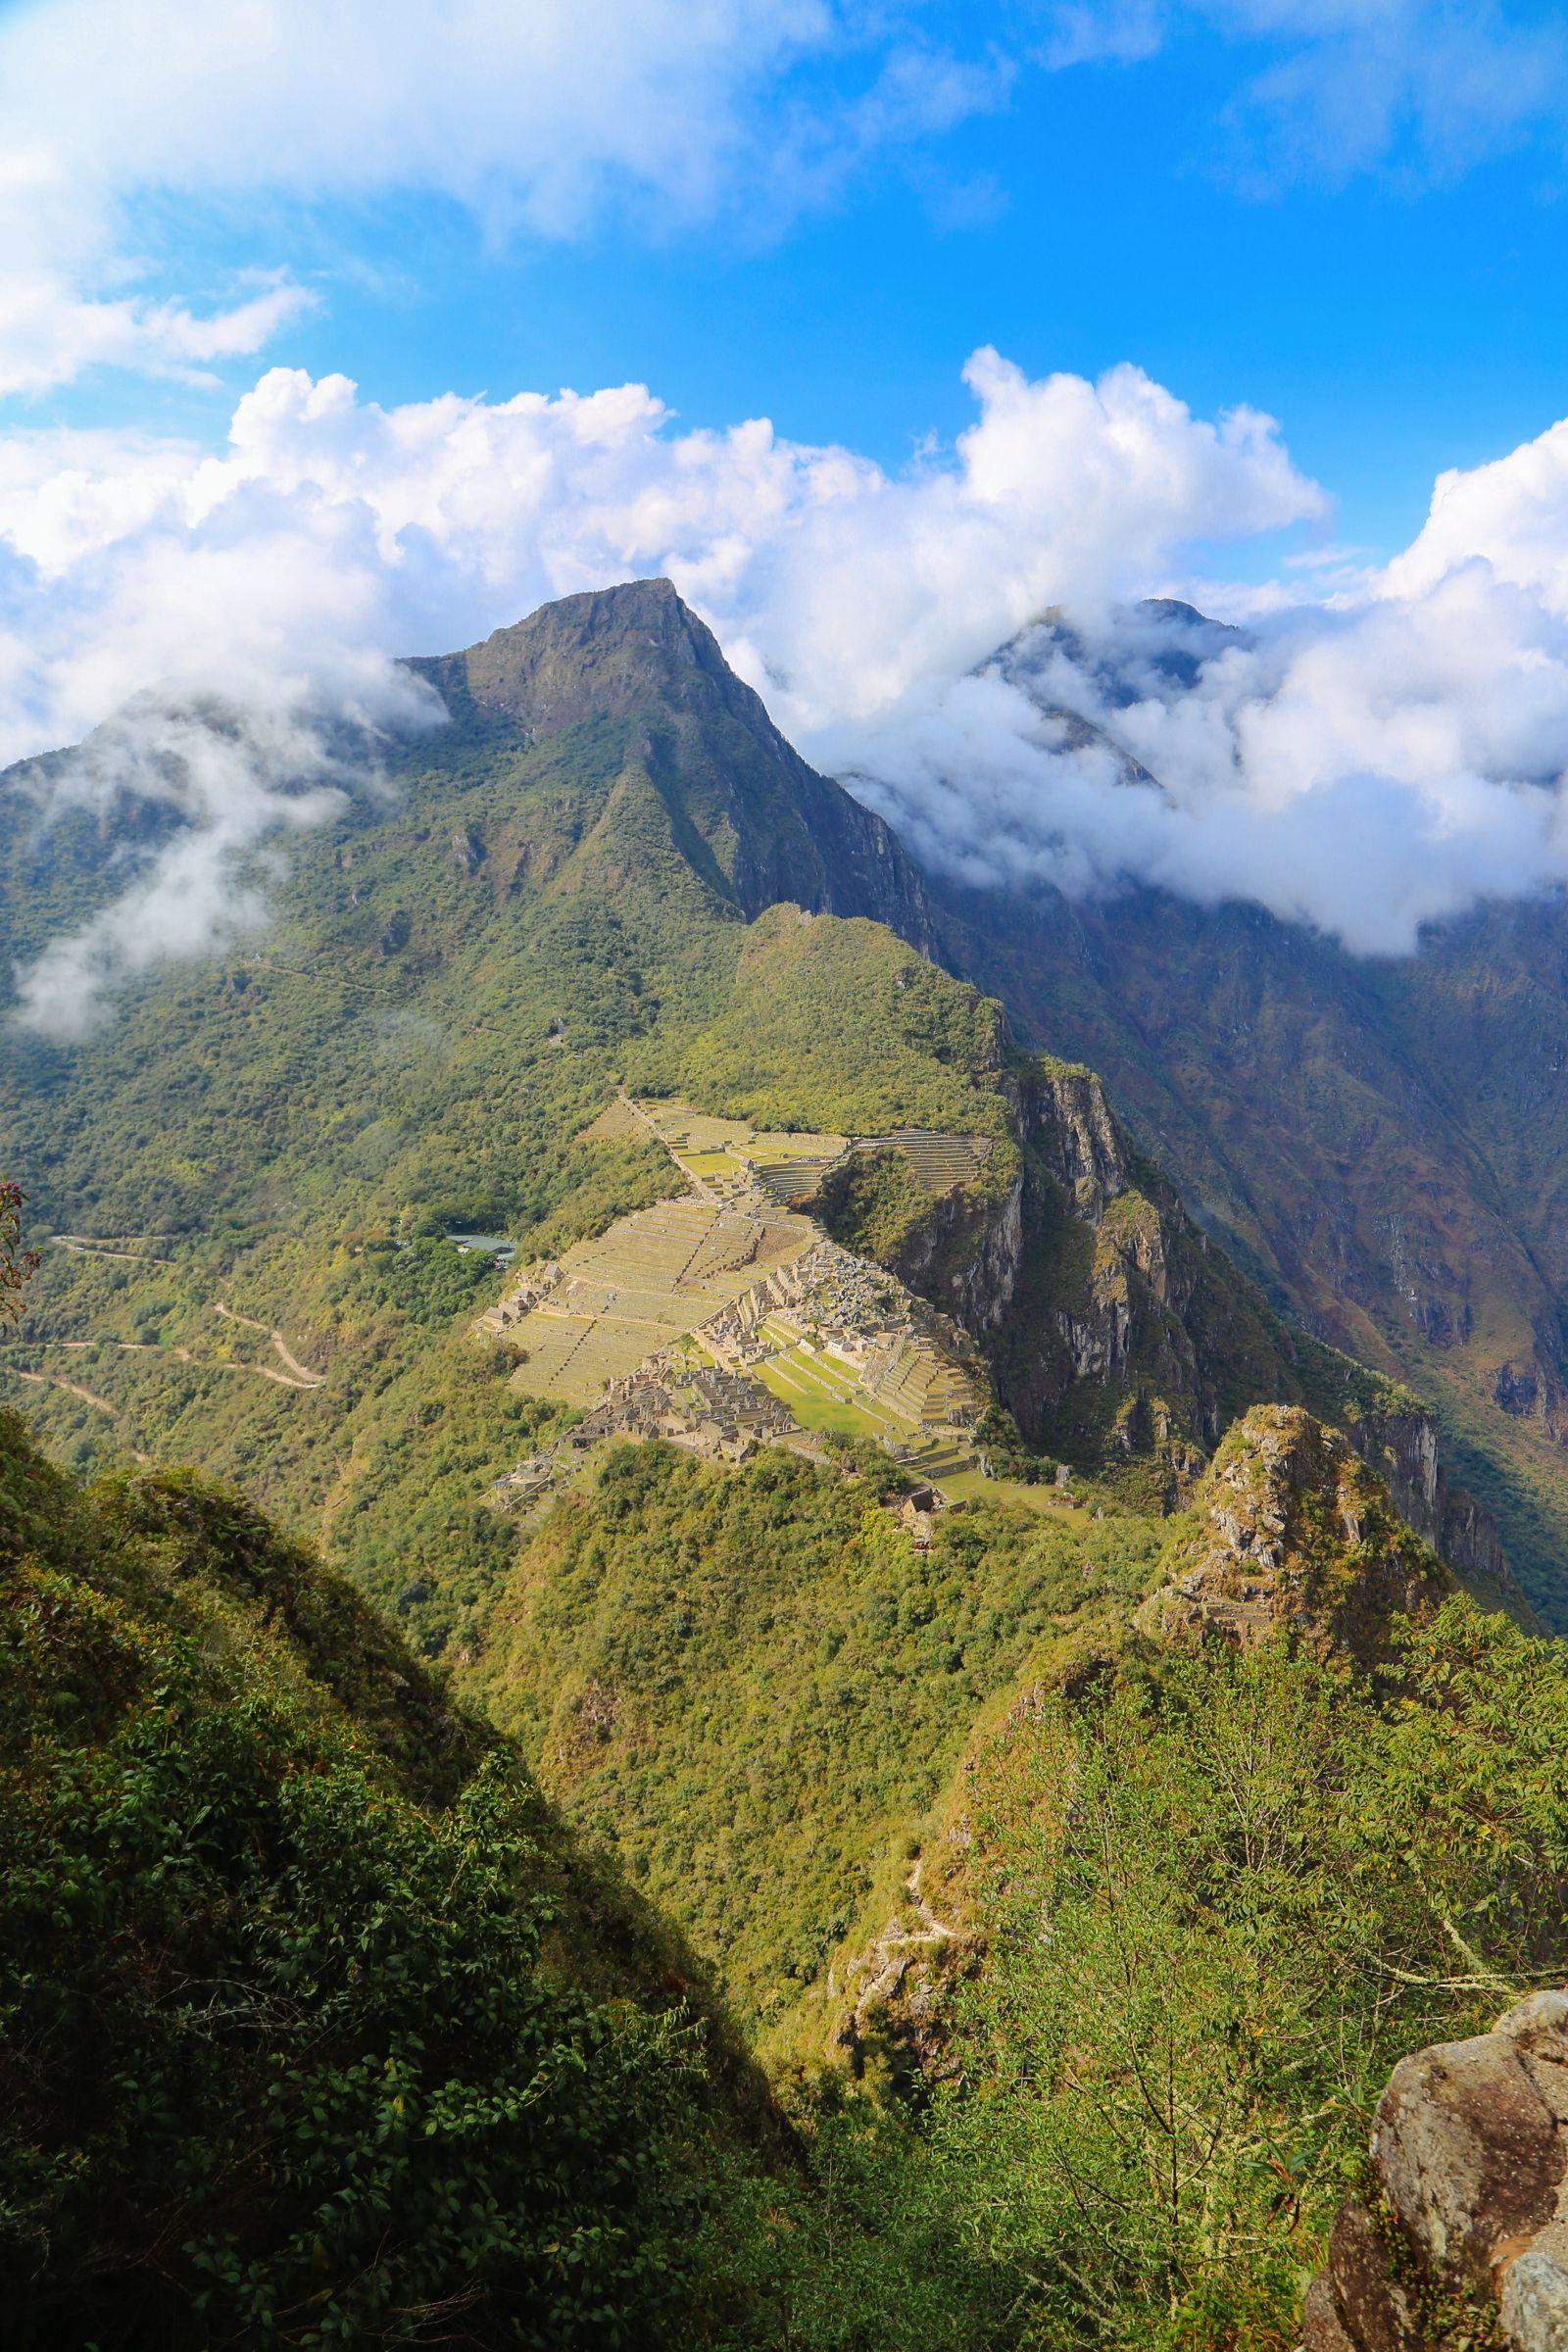 Unique view of Machu Picchu from the top of Huayna Picchu Mountain, Peru